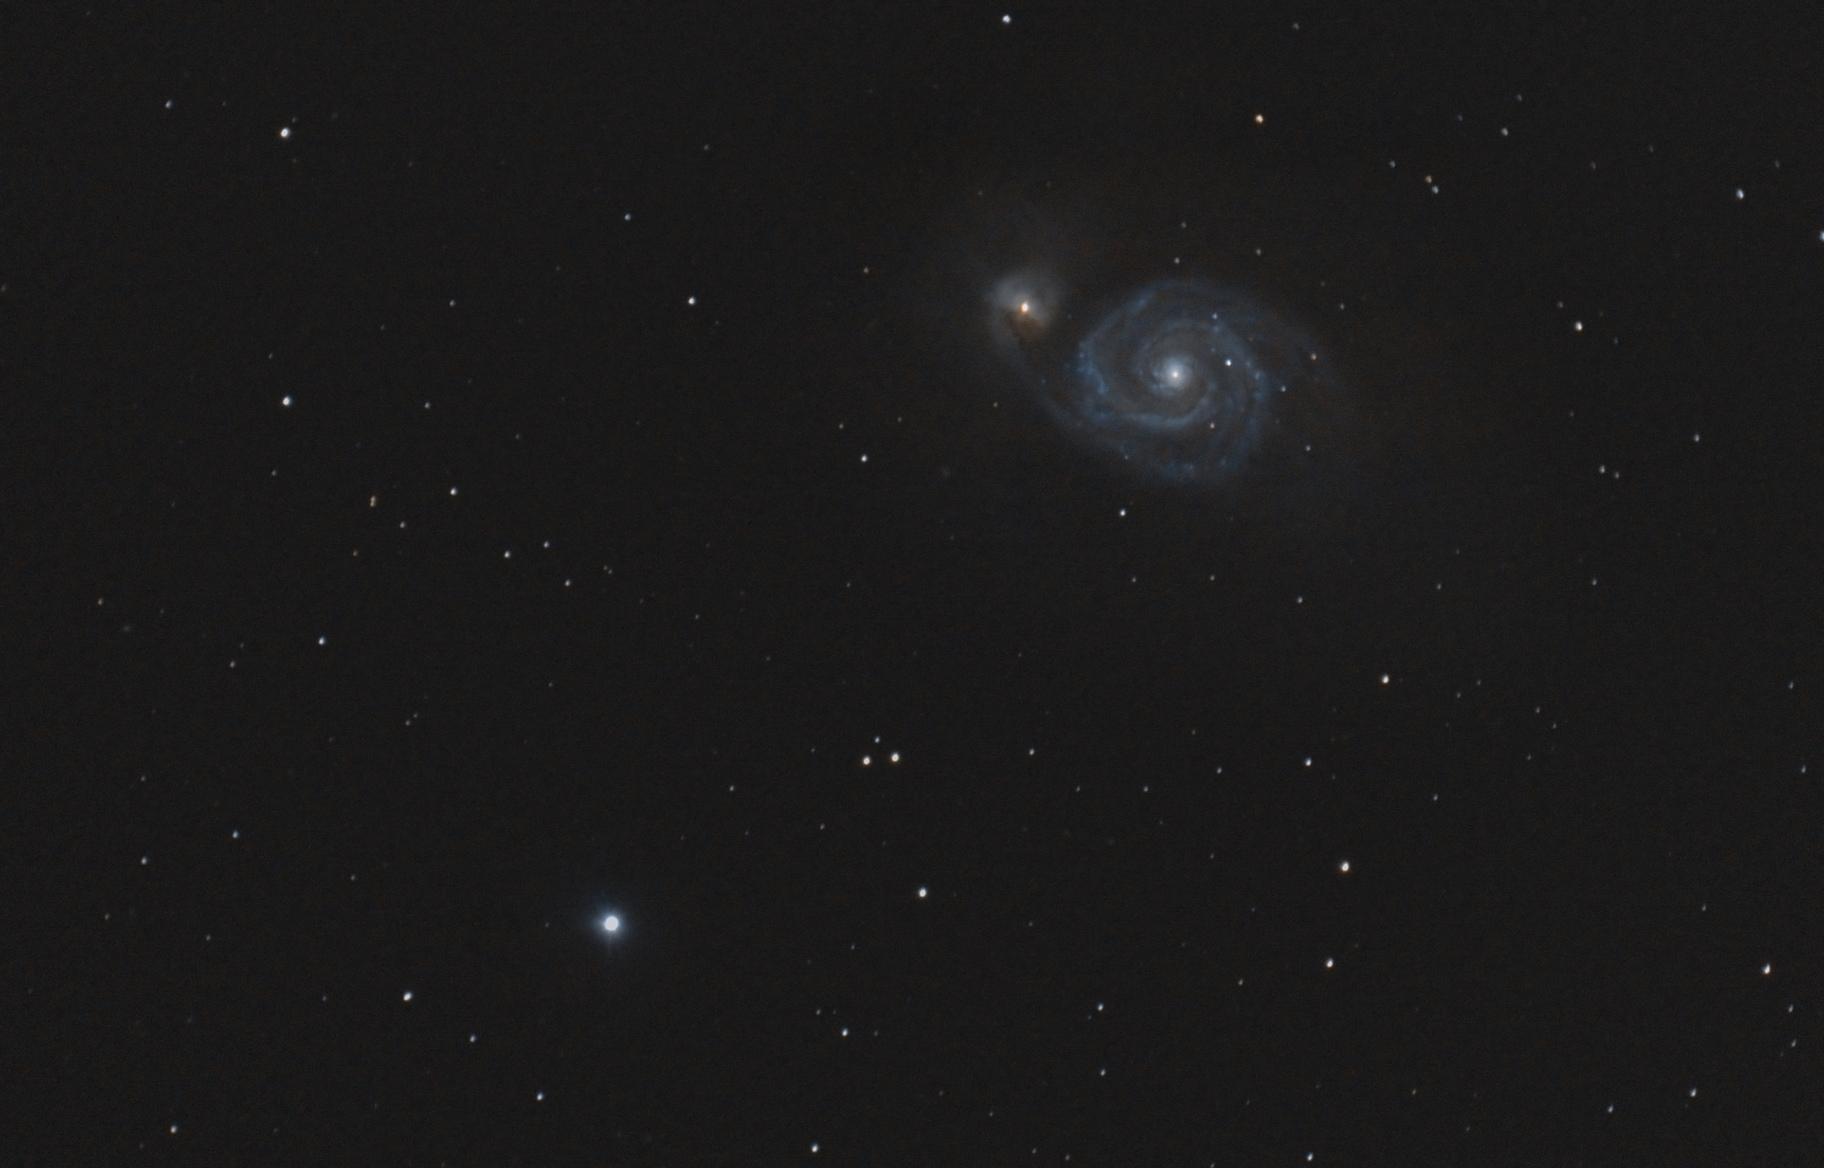 M51.jpg.3335d1d7bfa788db8a289796829fb413.jpg